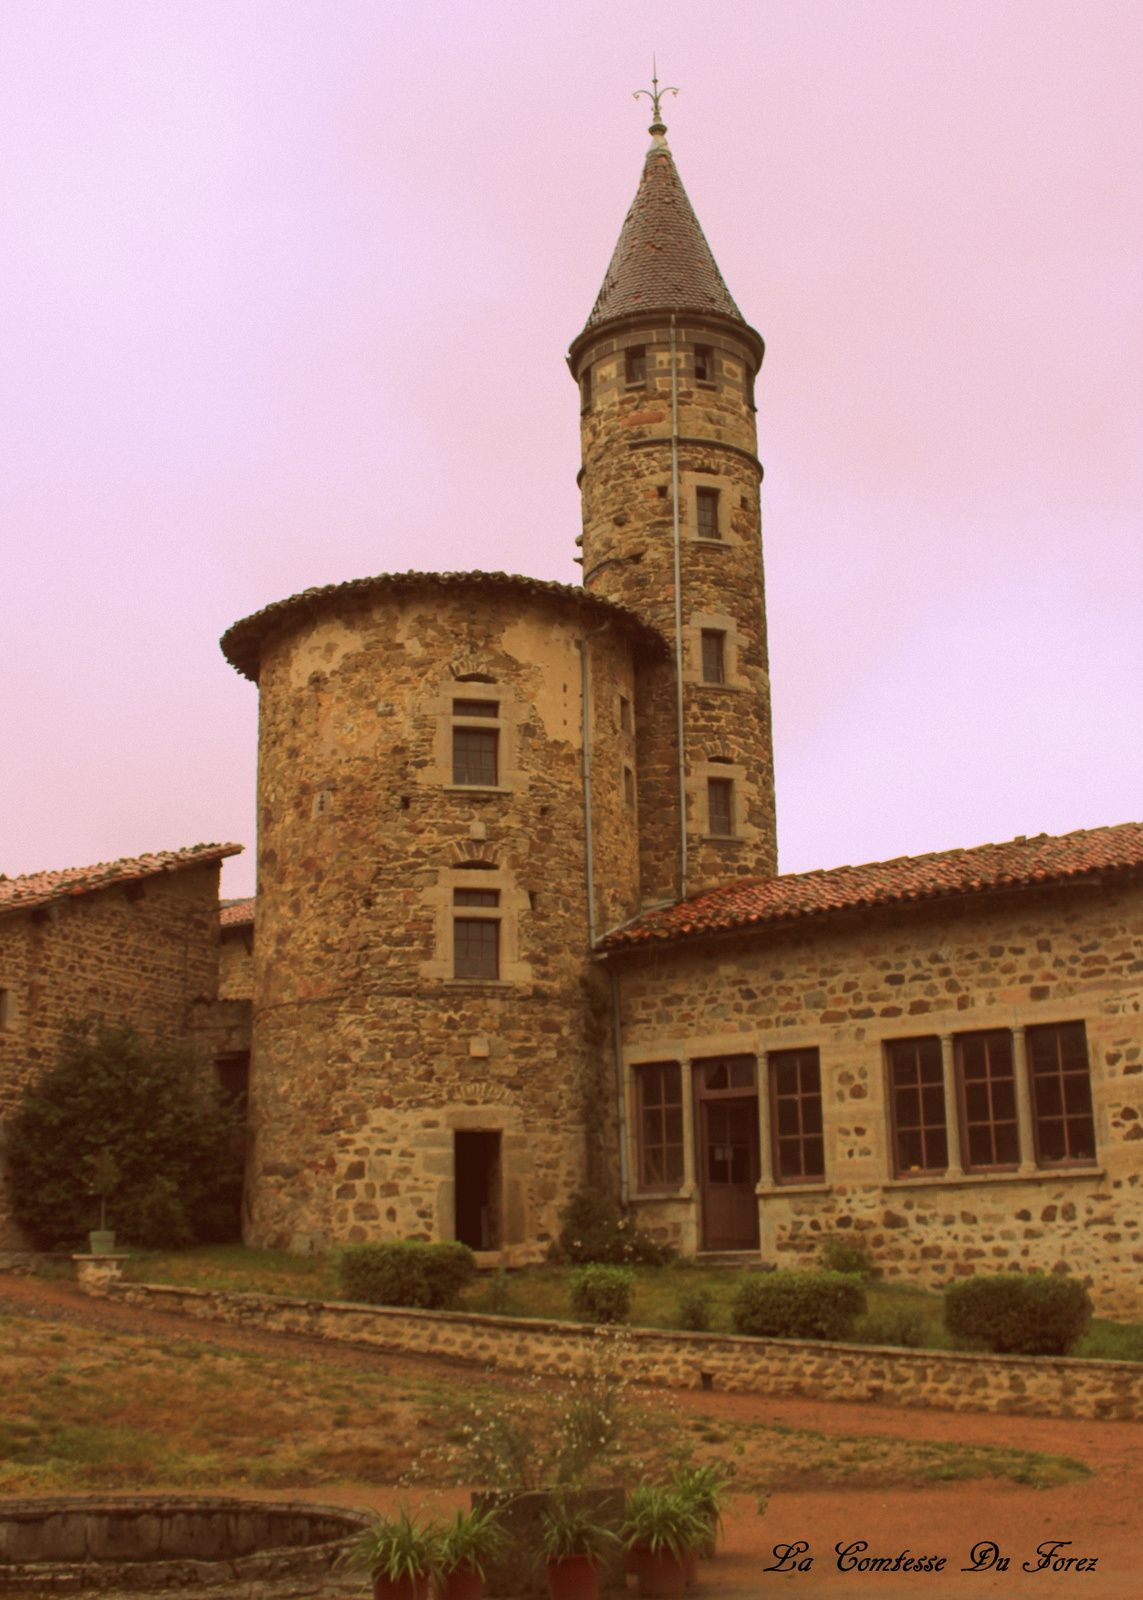 Château de Saconay 69590 Pomeys (Rhône, 69)